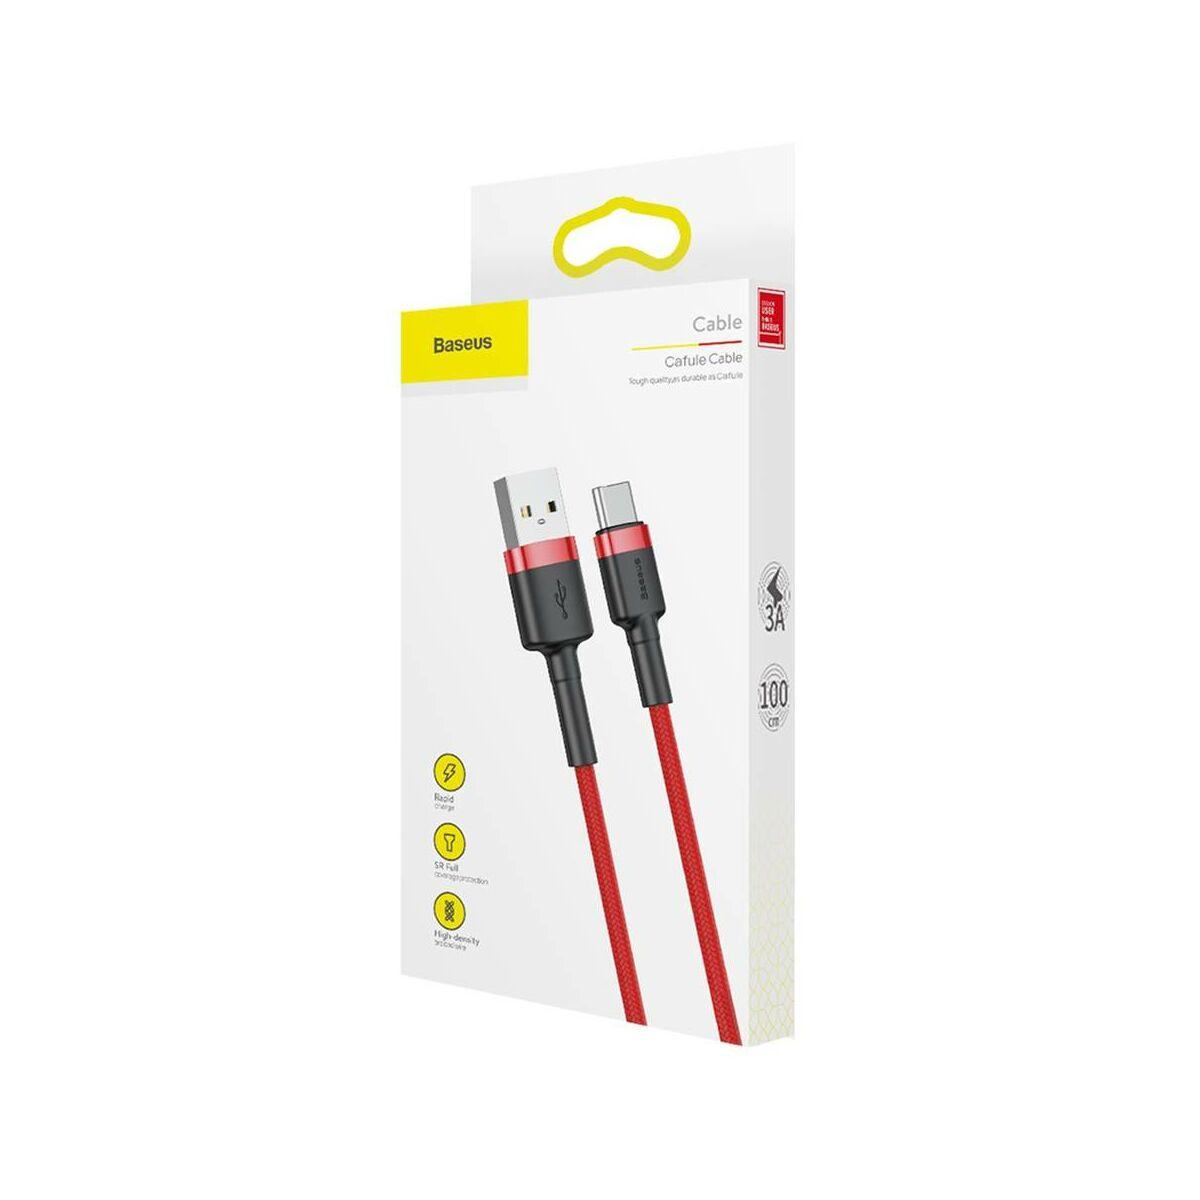 Baseus Type-C kábel, Cafule, 3A, 1m, piros/piros (CATKLF-B09)